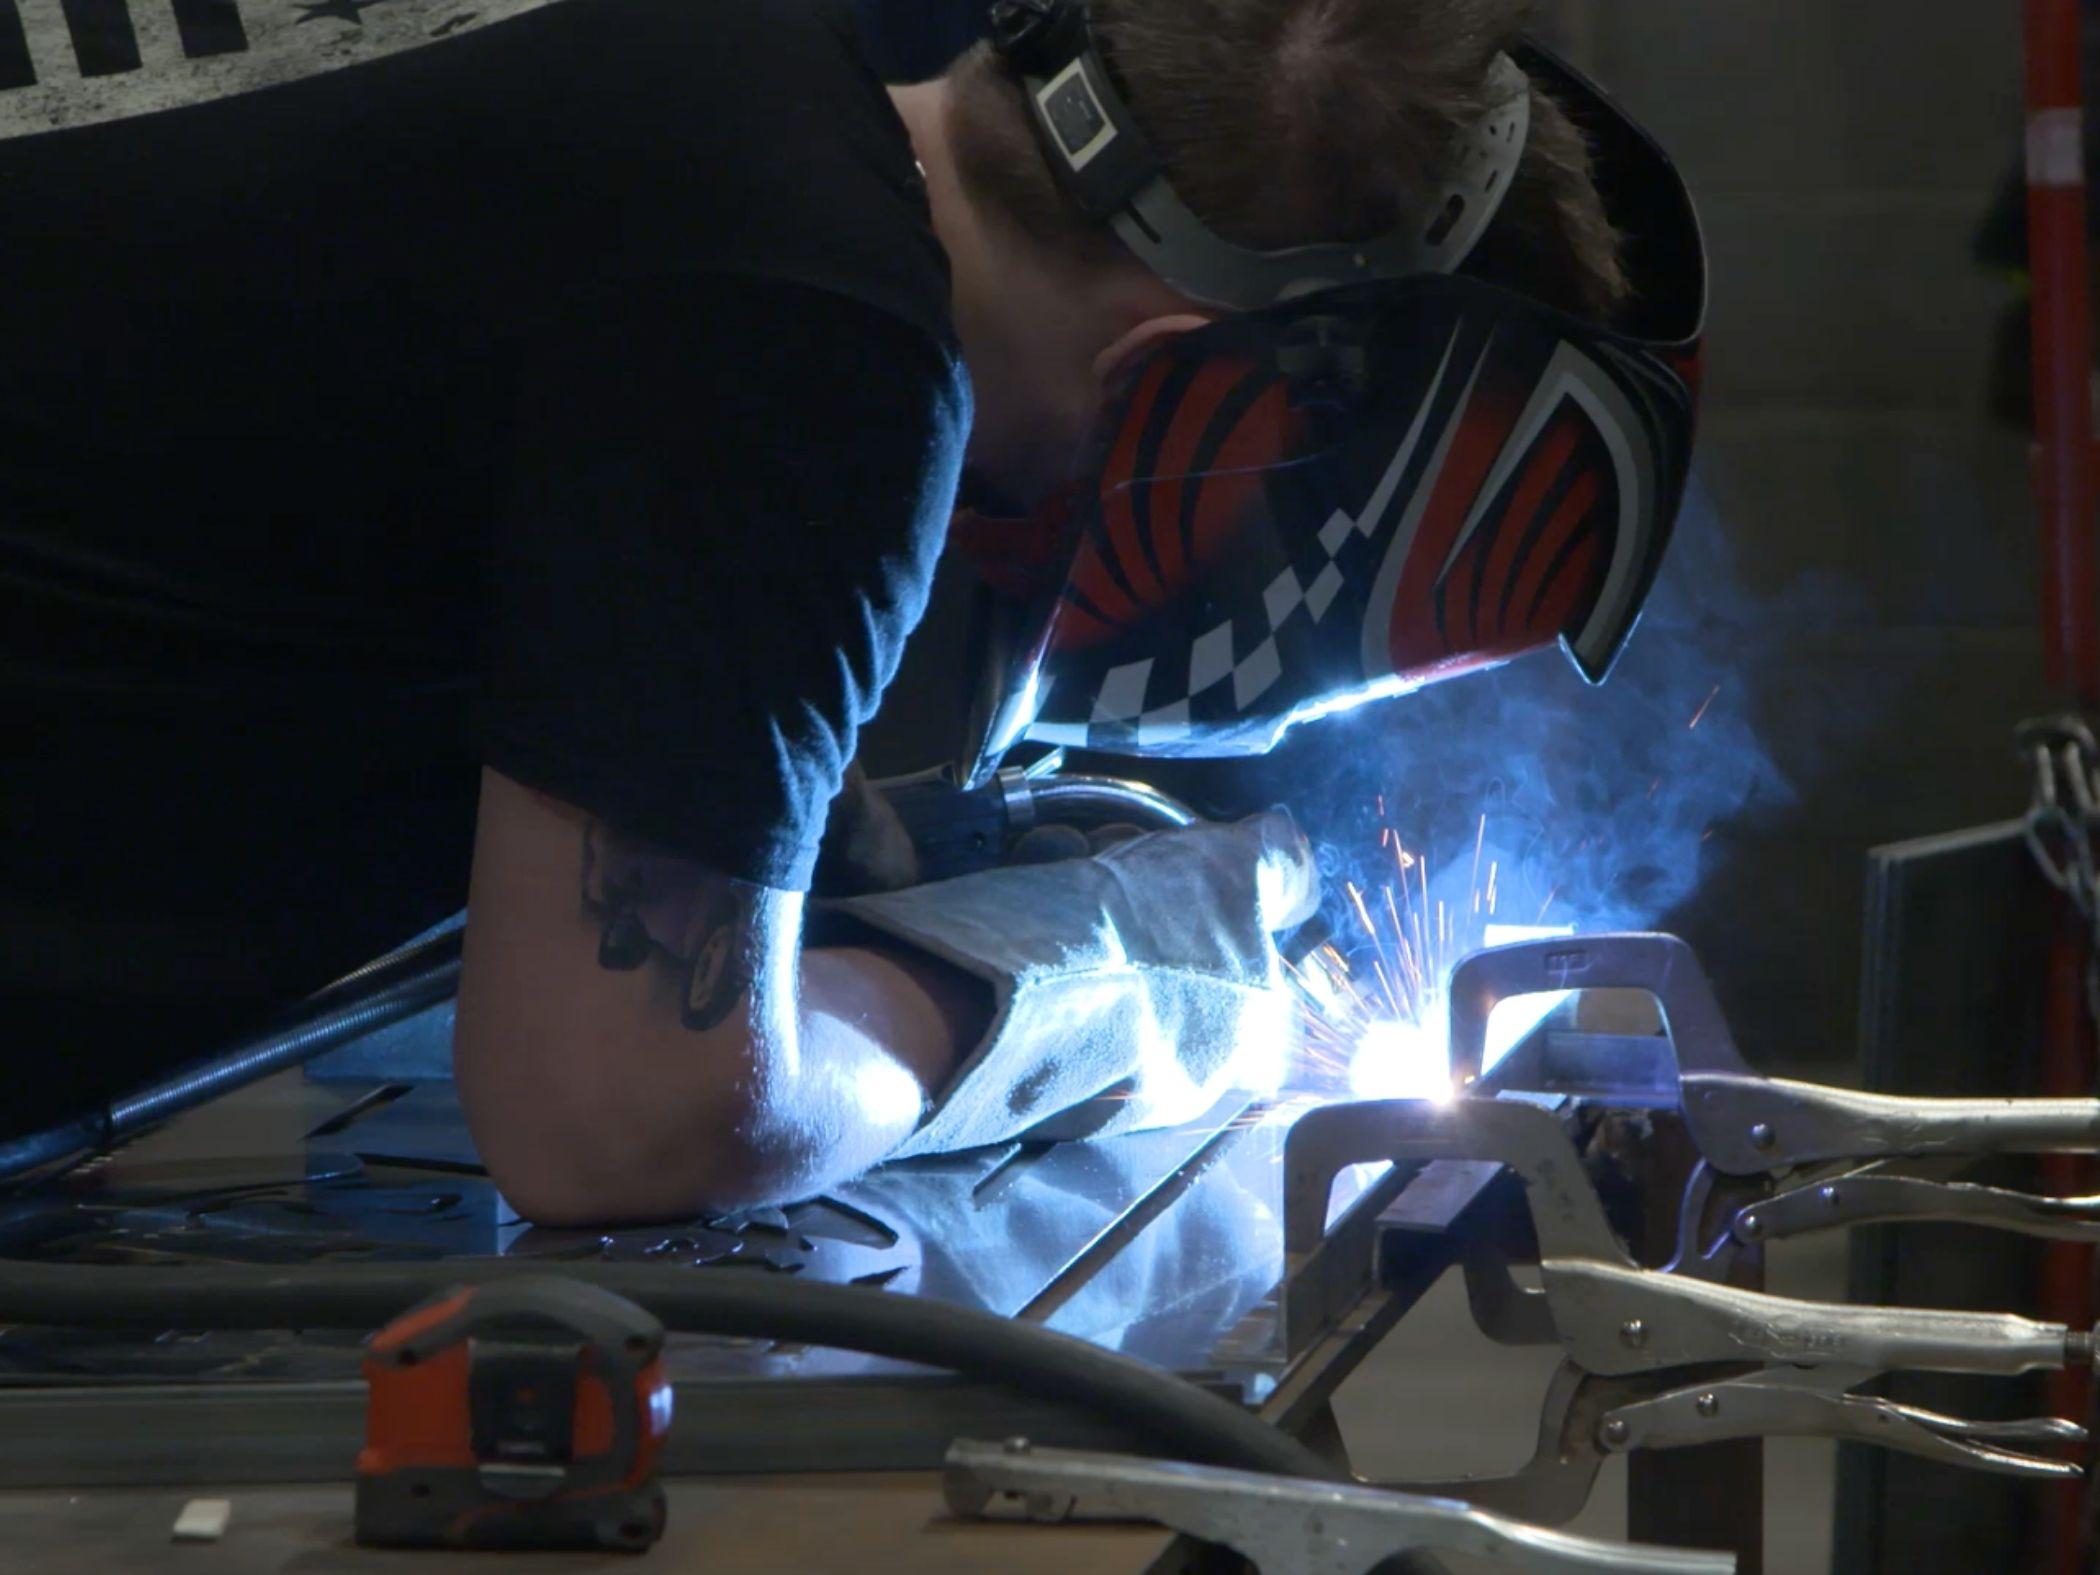 student welding in class